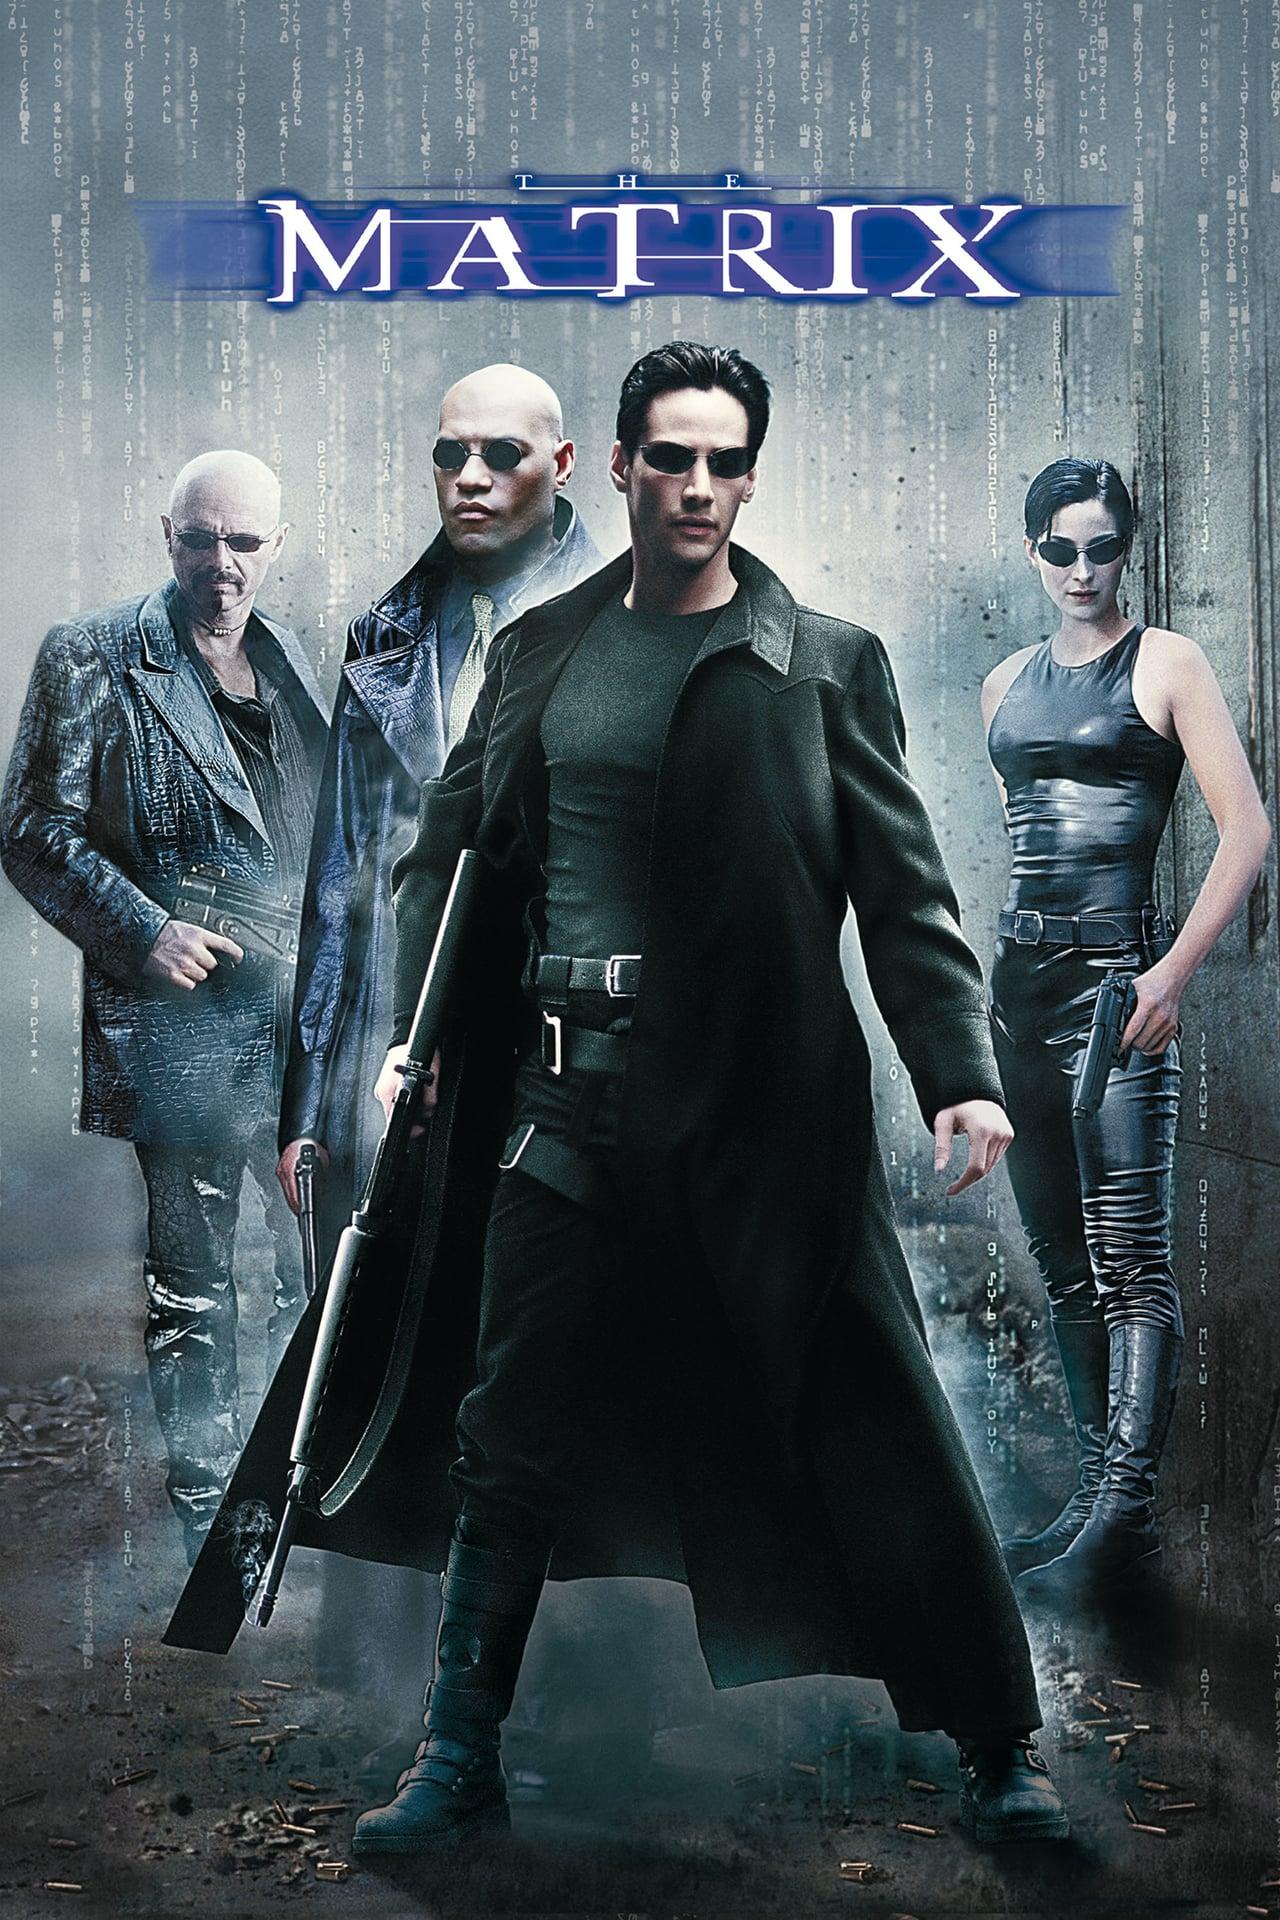 The Matrix by Lana Wachowski